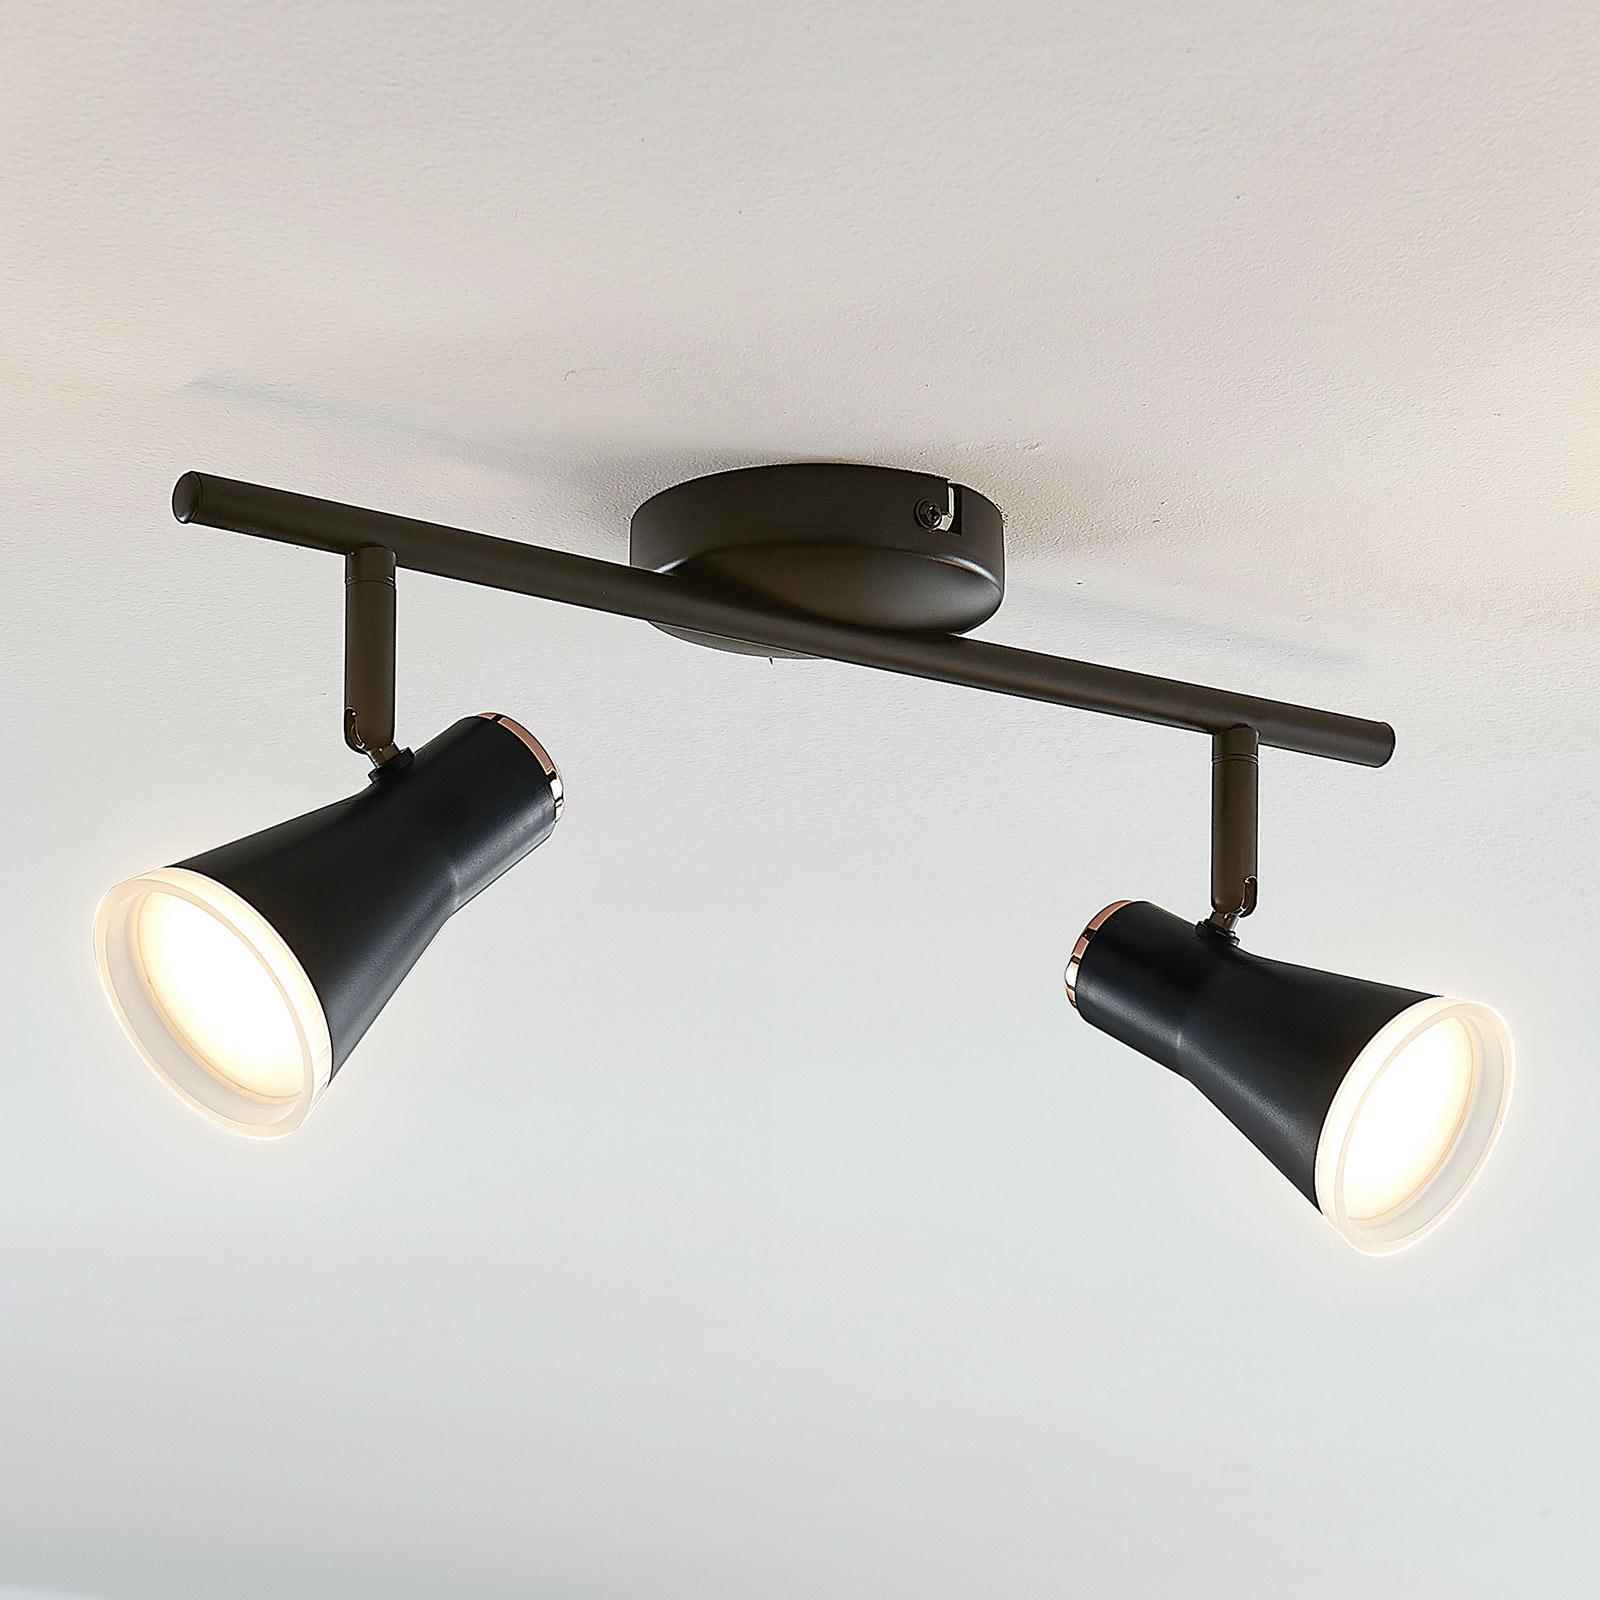 LED-takspot Michiko, svart, 2 lyskilder